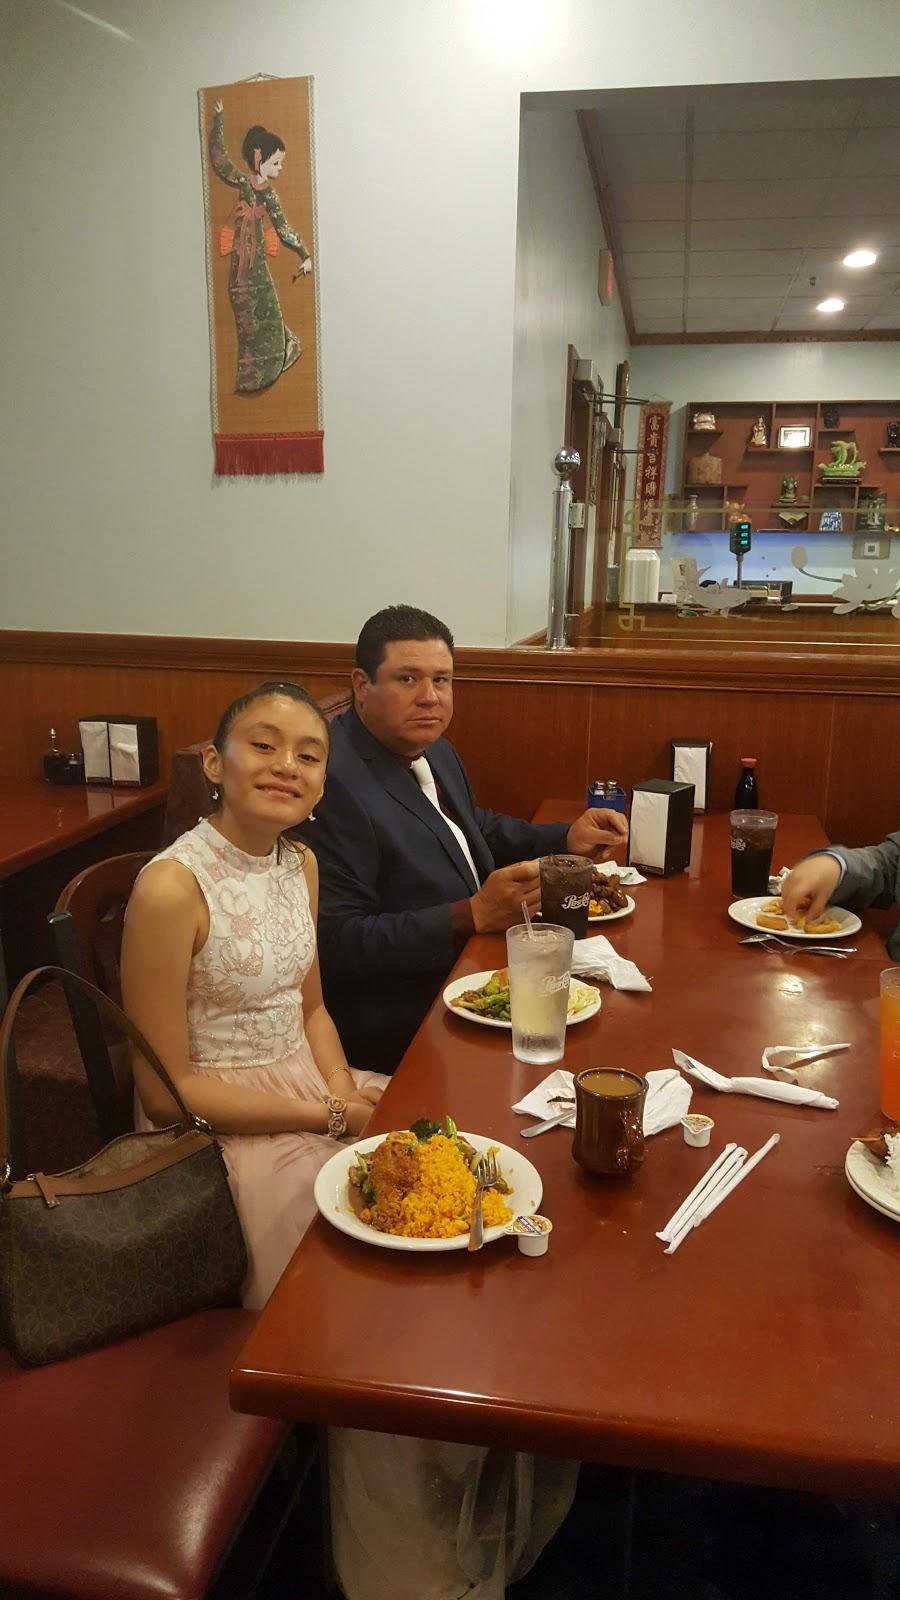 CHINESE NO.1 BUFFET - restaurant  | Photo 2 of 10 | Address: 1008 W Roosevelt Blvd, Monroe, NC 28110, USA | Phone: (704) 225-9100